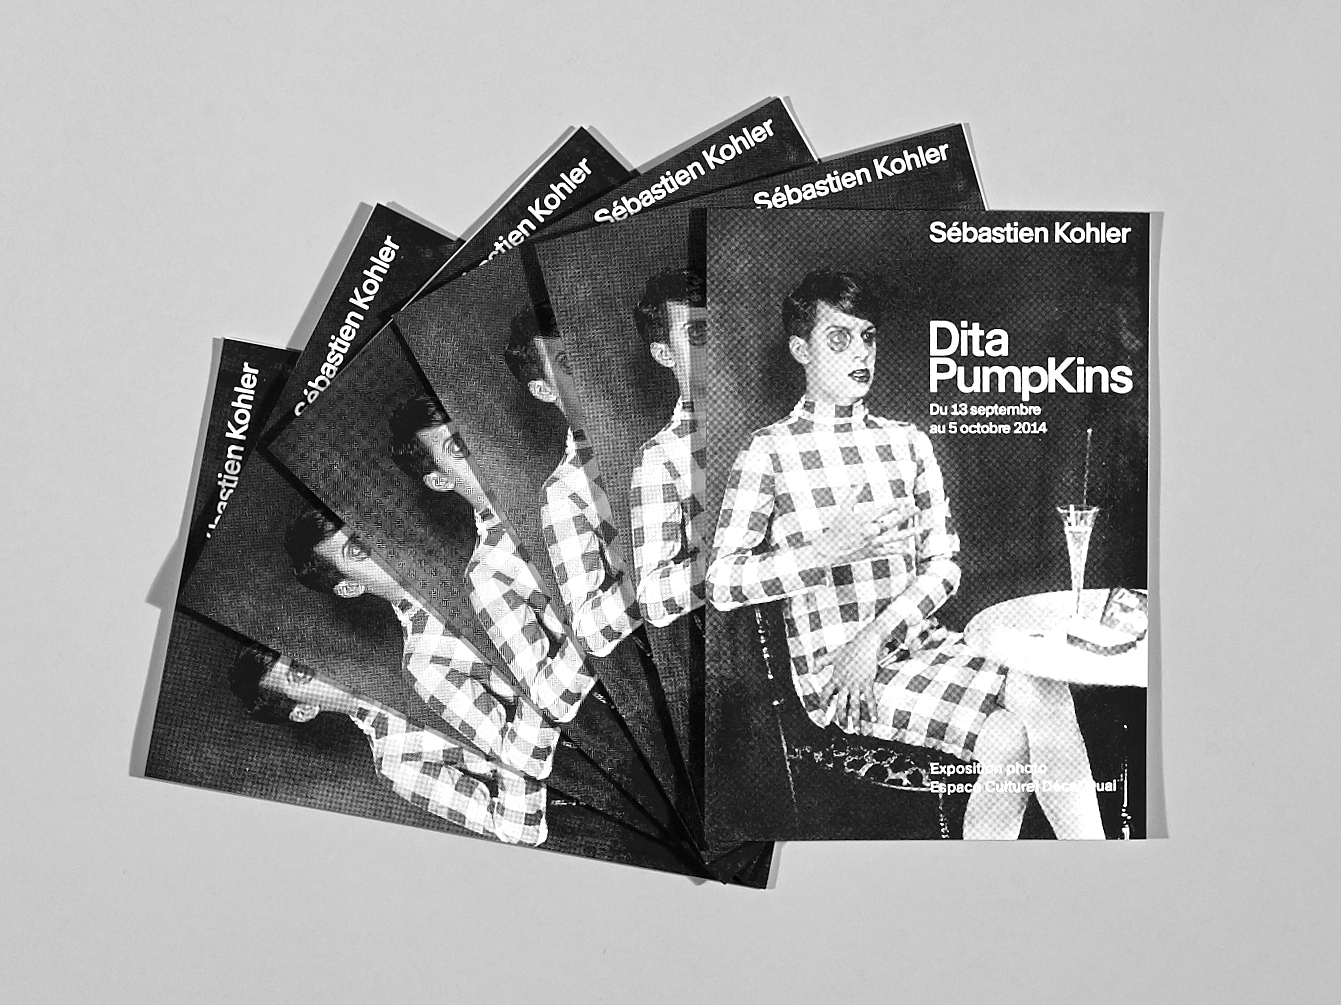 Dita Pumkins - Avalanche